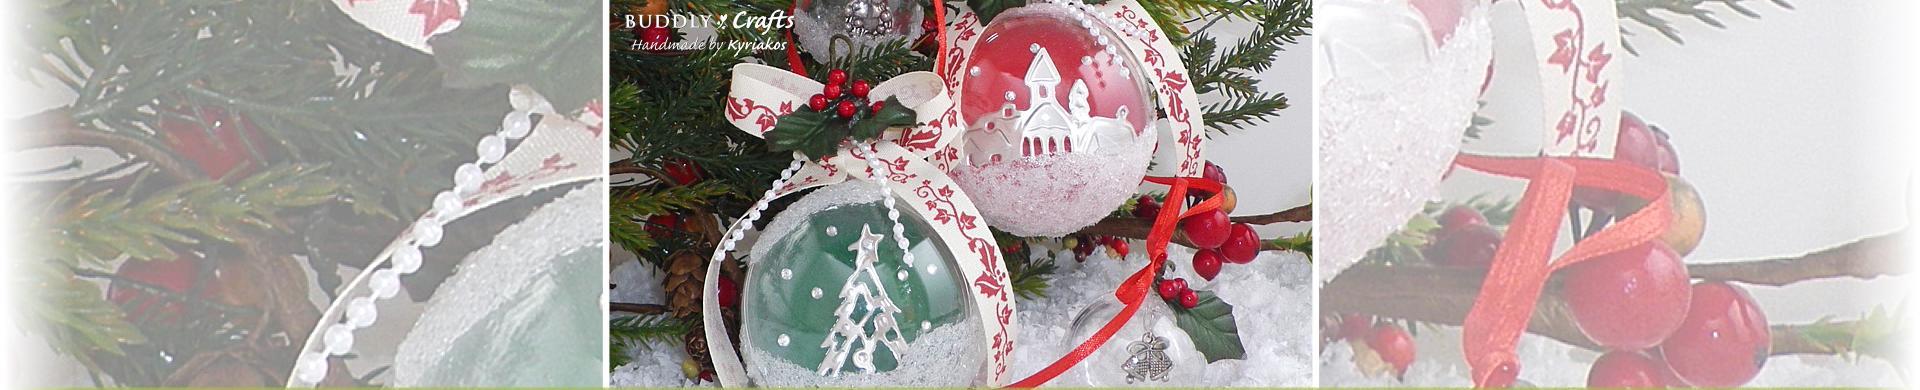 Christmas Tree Baubles Tutorial